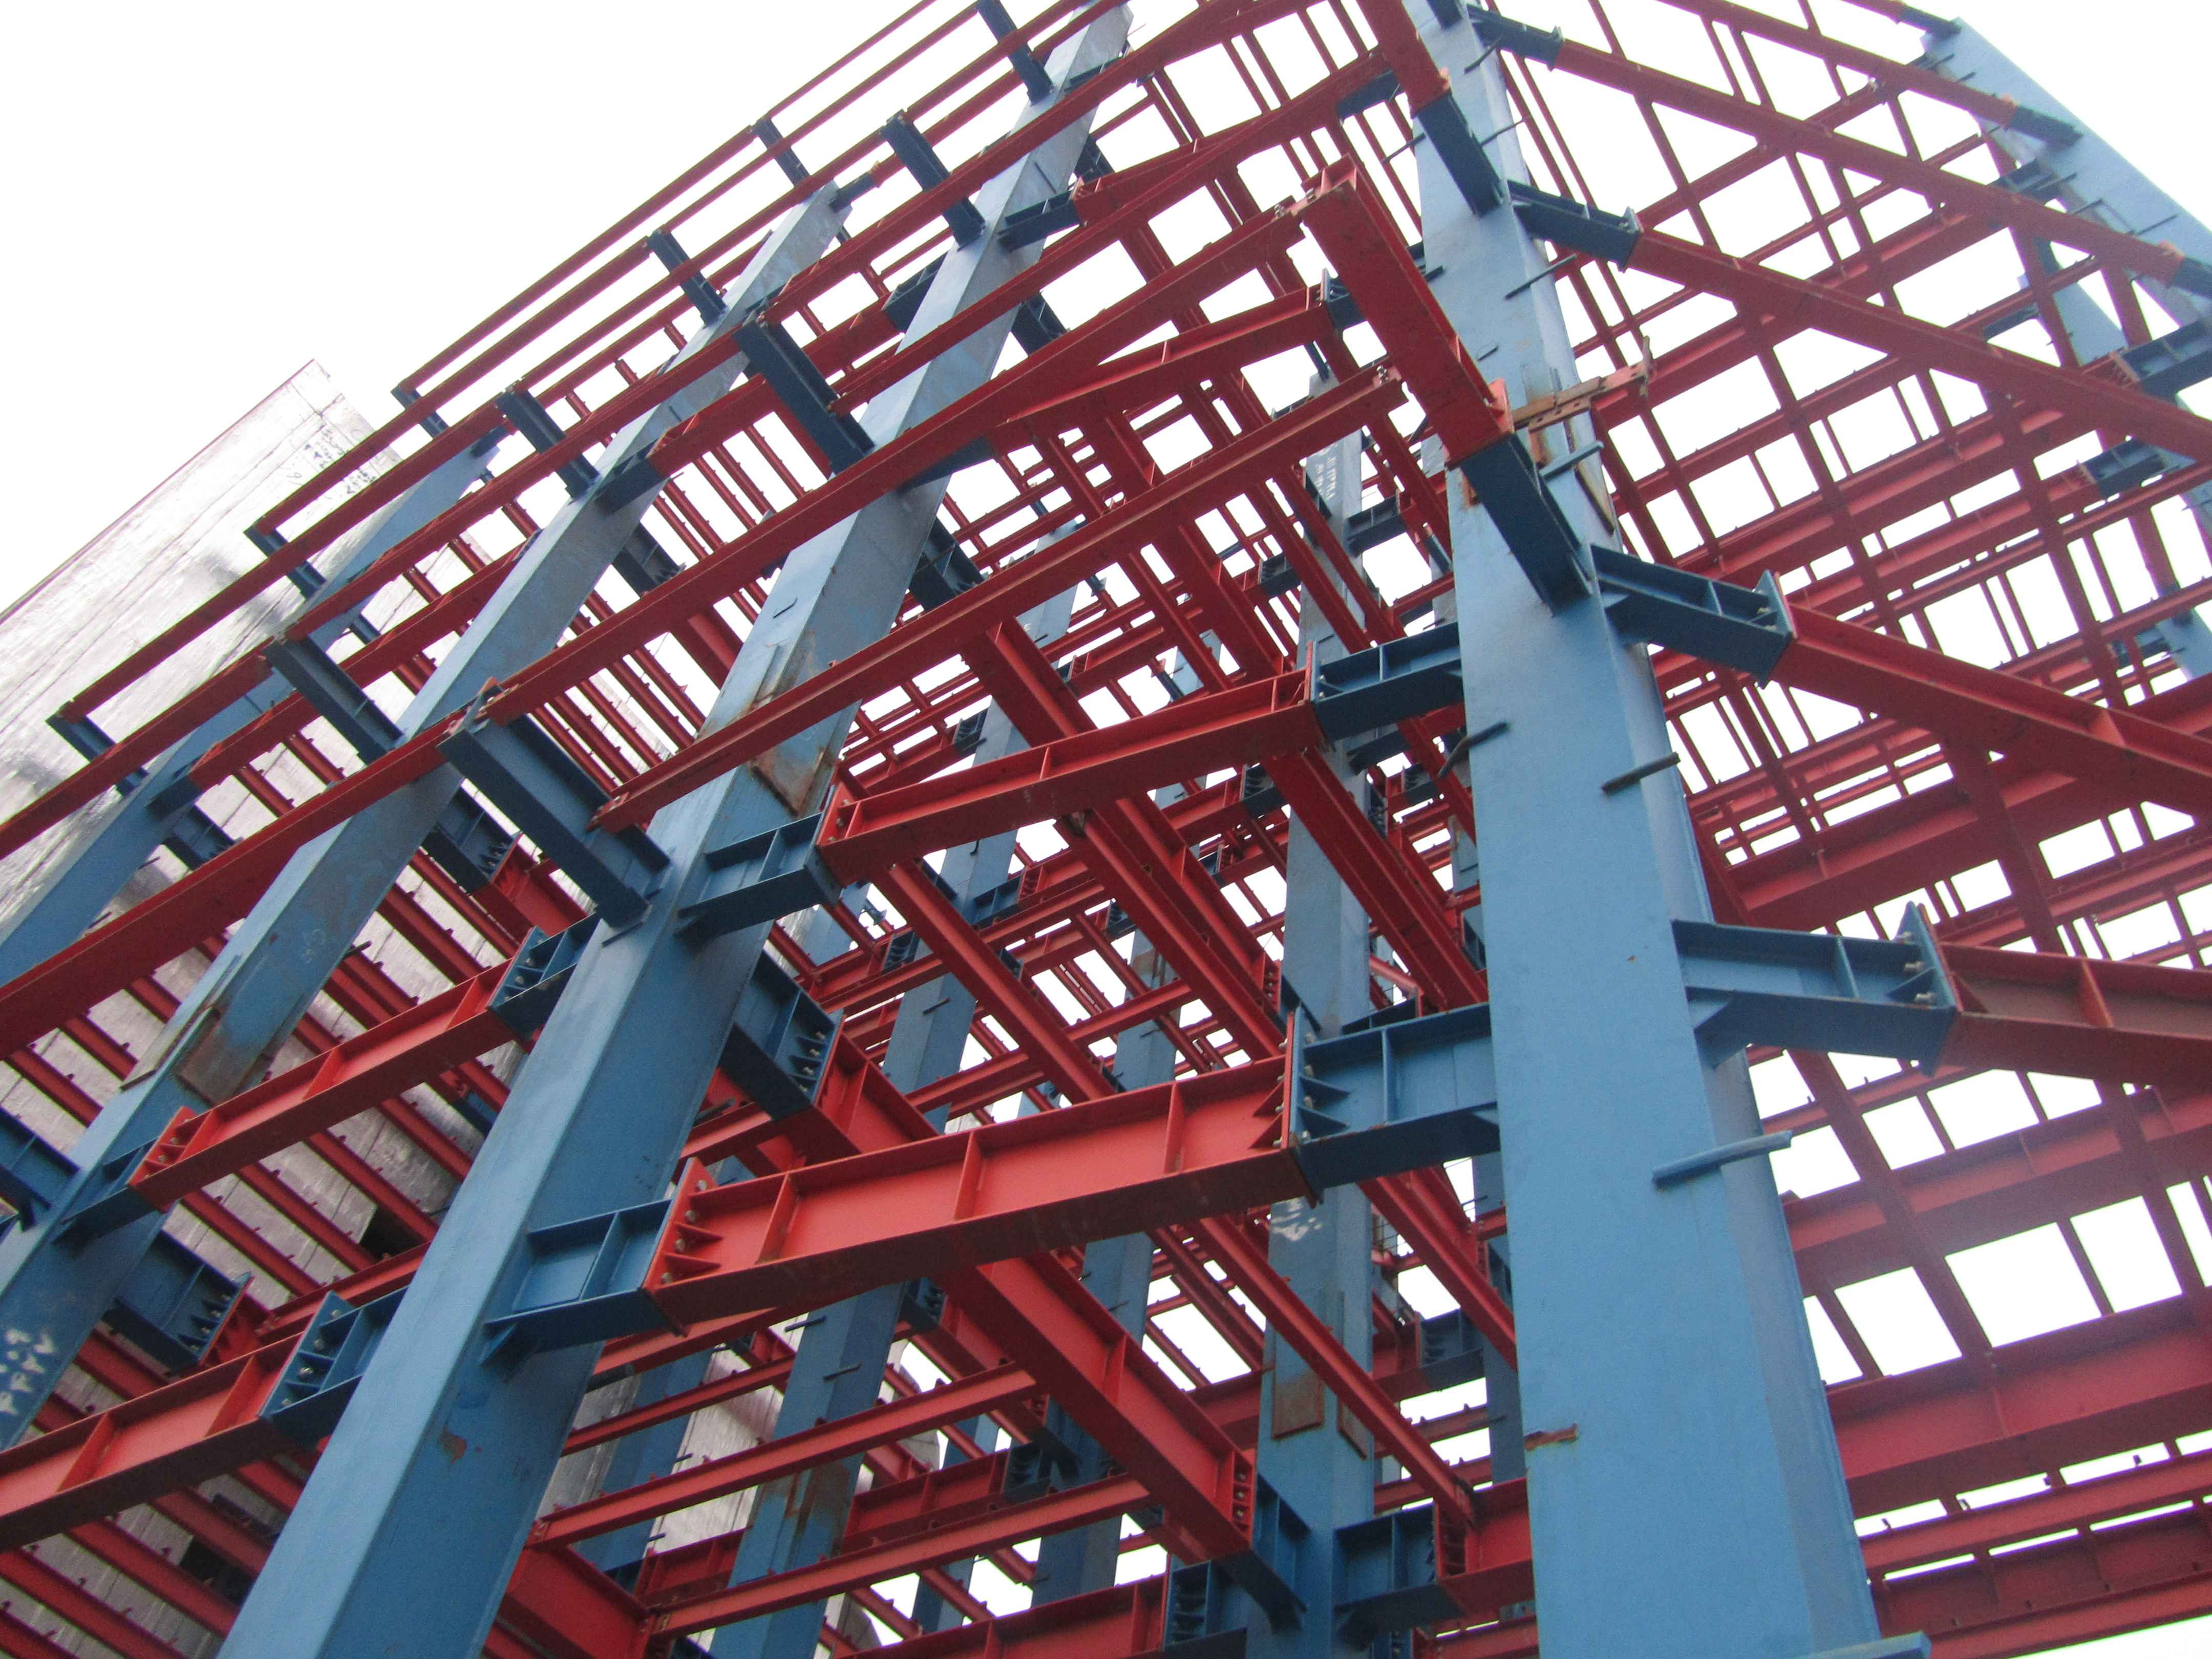 Image result for اجرای صنعتی ساختمان های فولادی